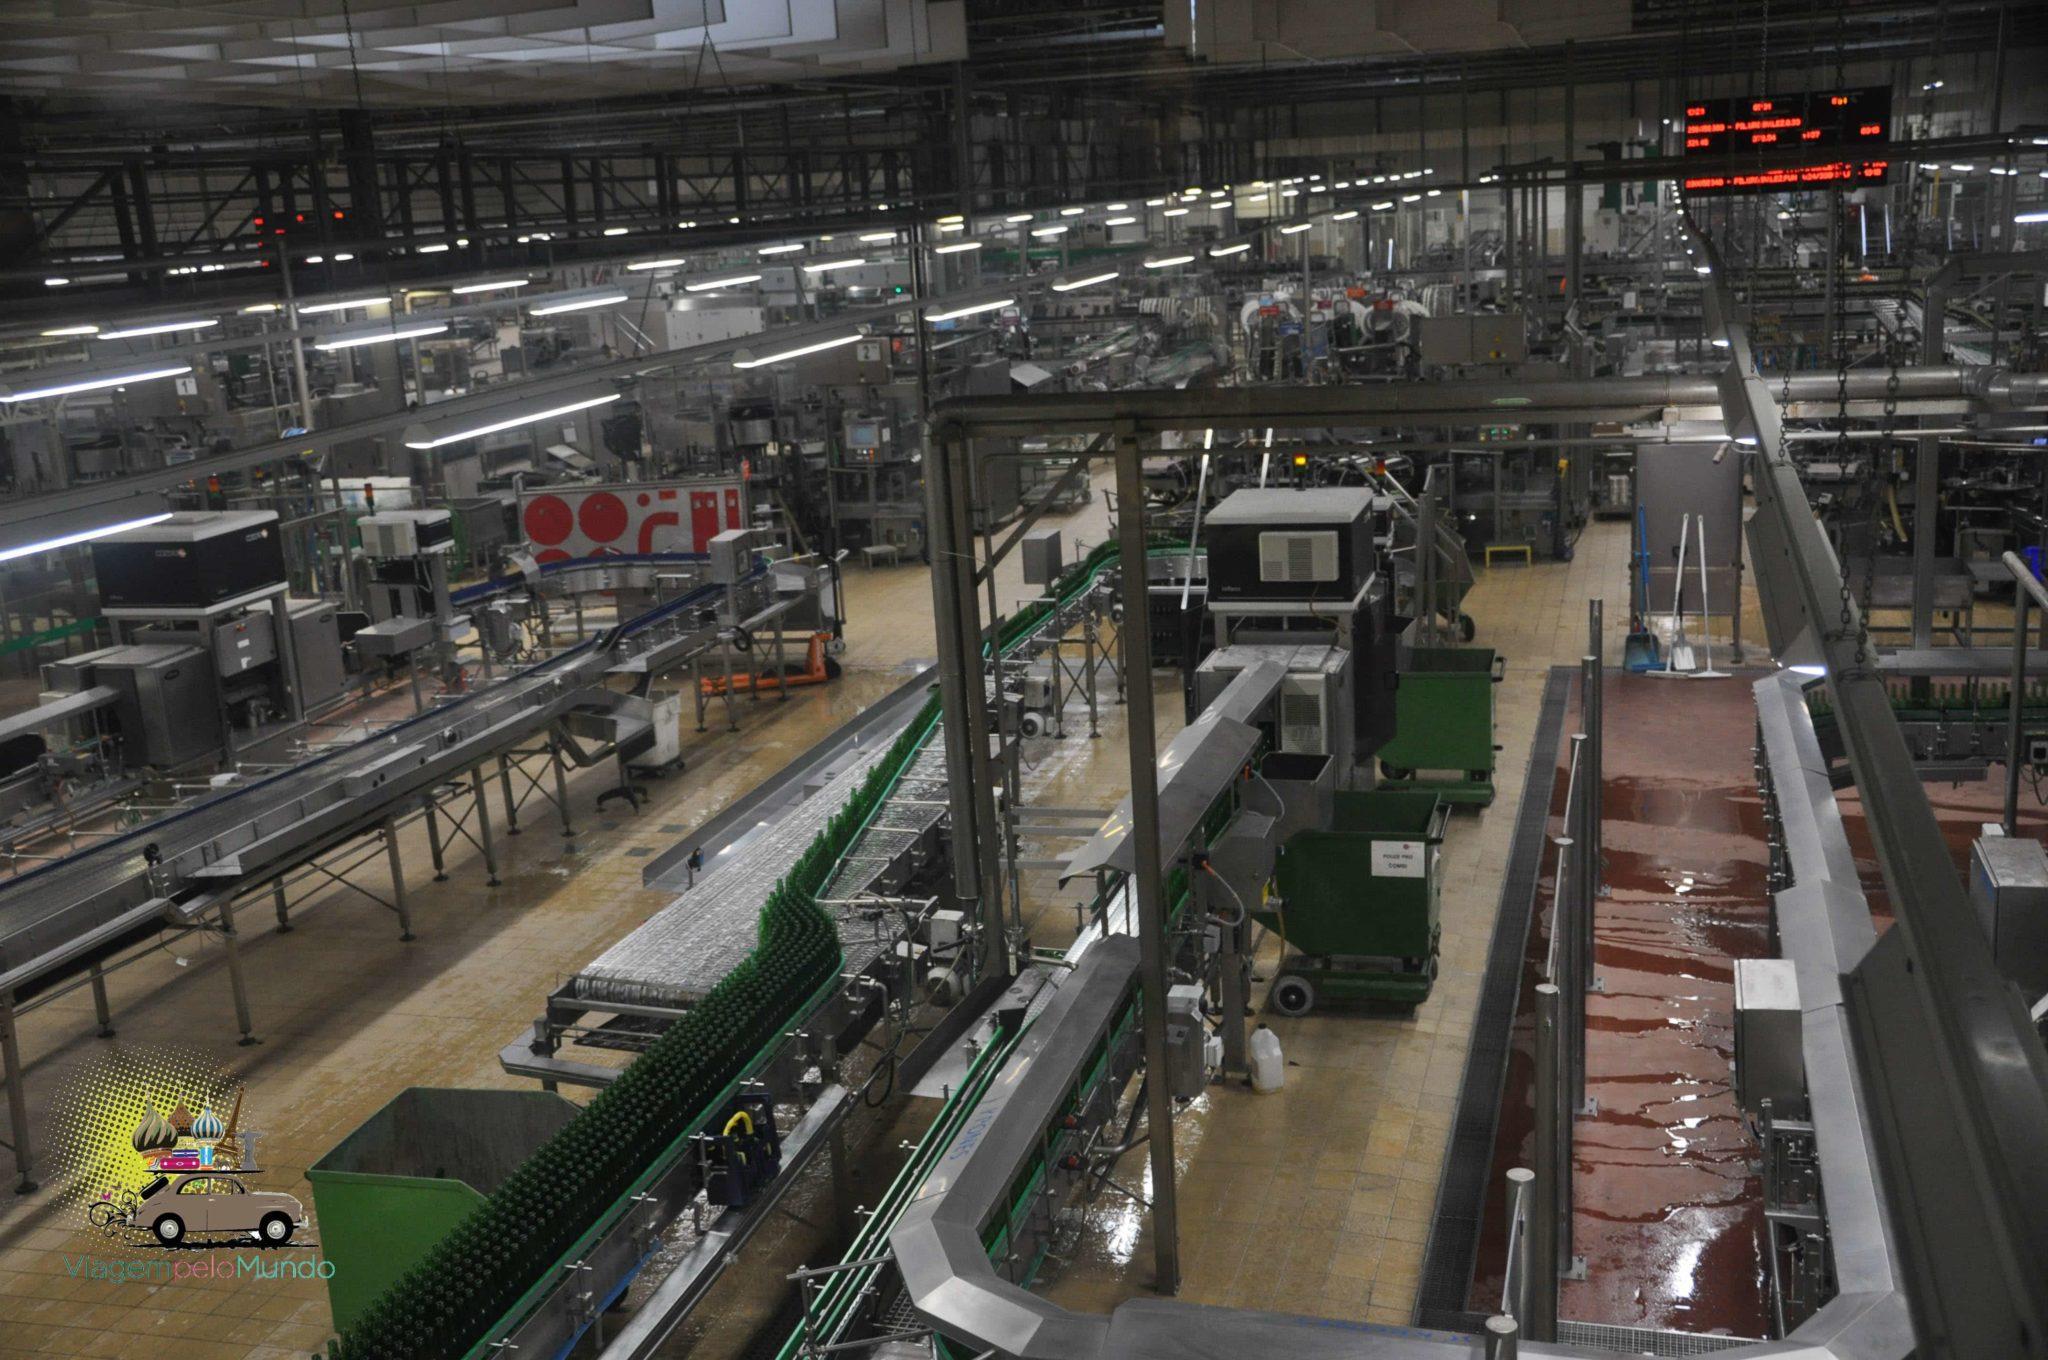 Visita cervejaria Pilsner Urquell